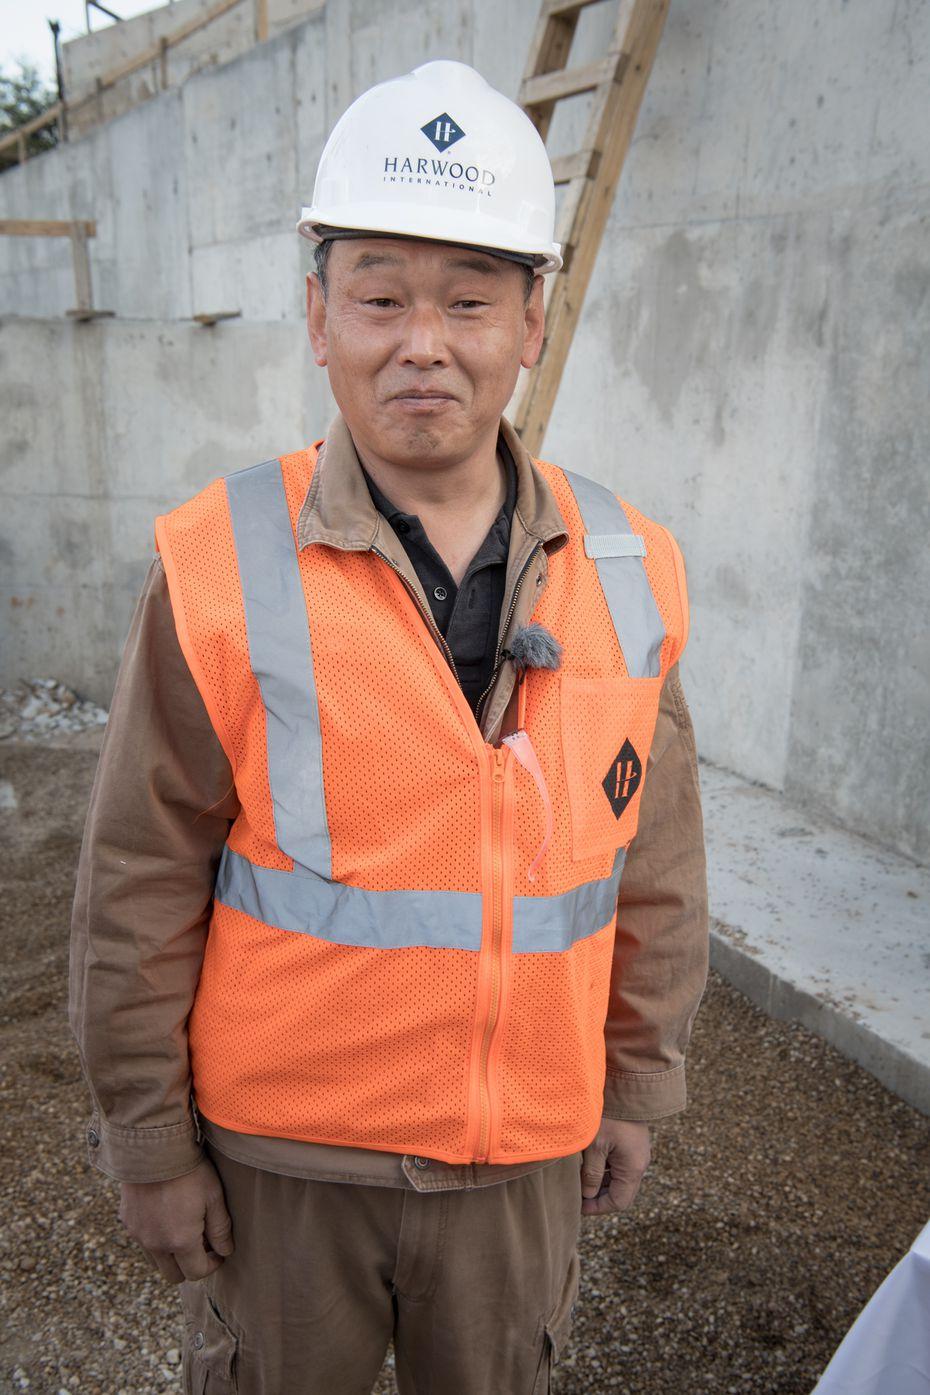 Suminori Awata is a Japanese stone mason working on the project.